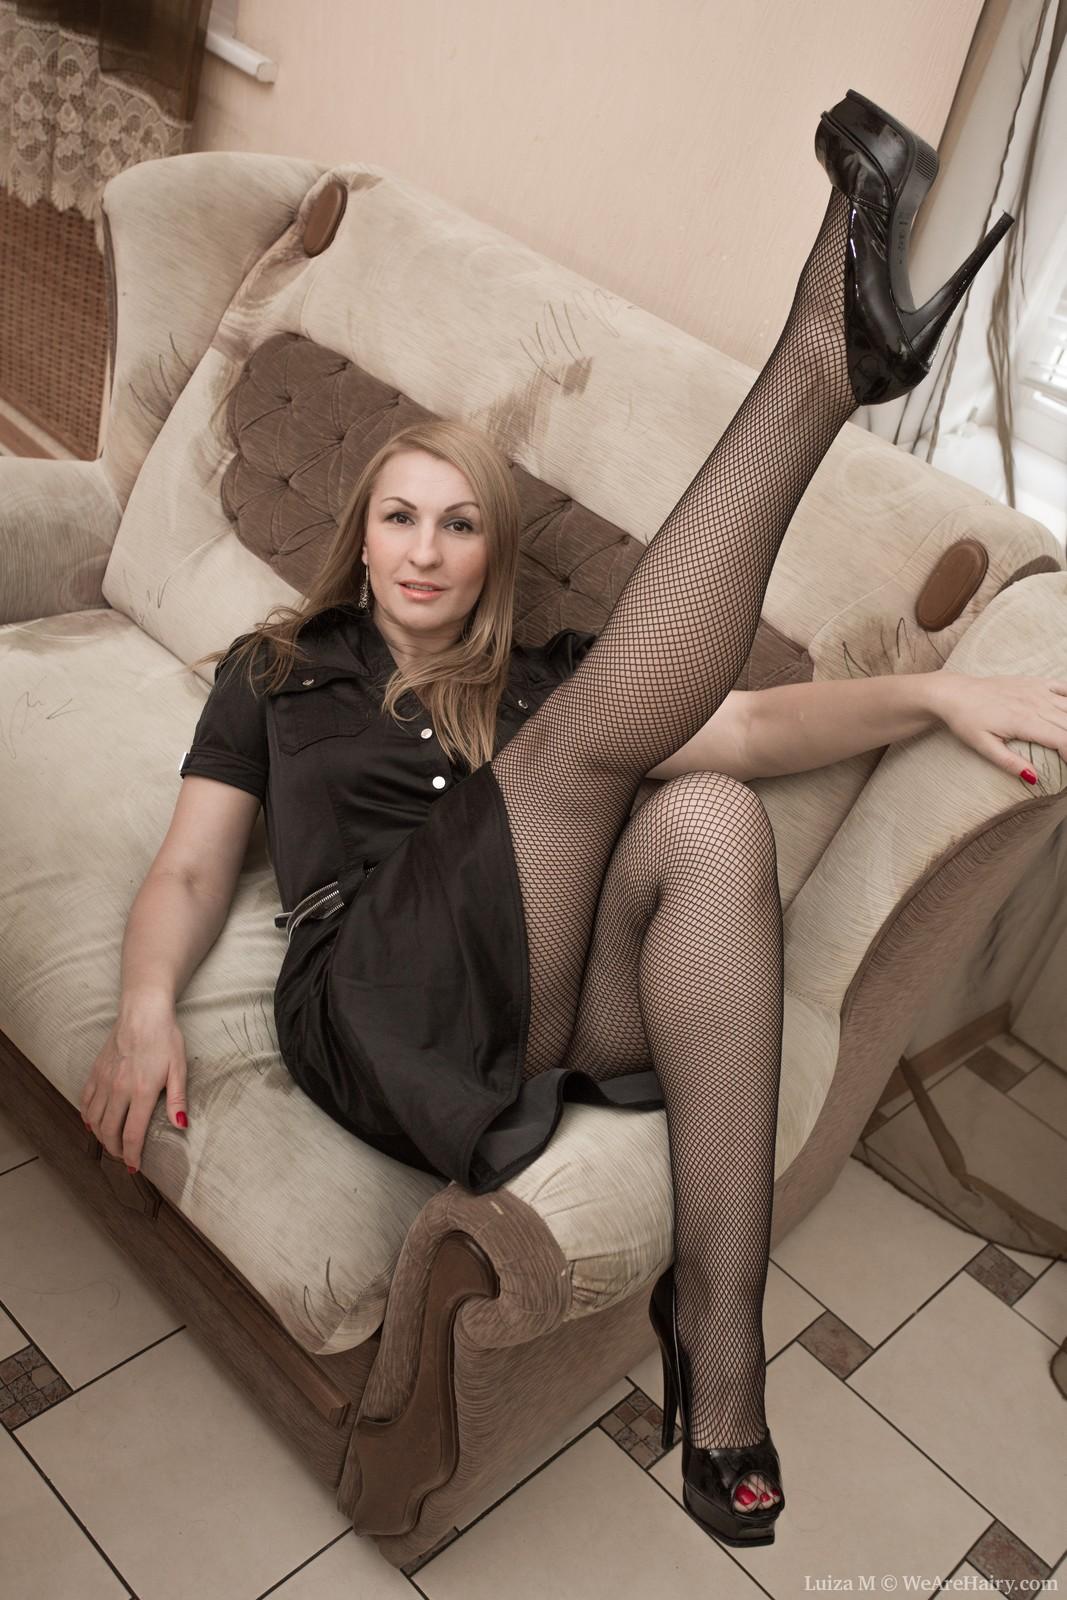 ukrainian hairy pussy mature lady luiza m the hairy lady blog